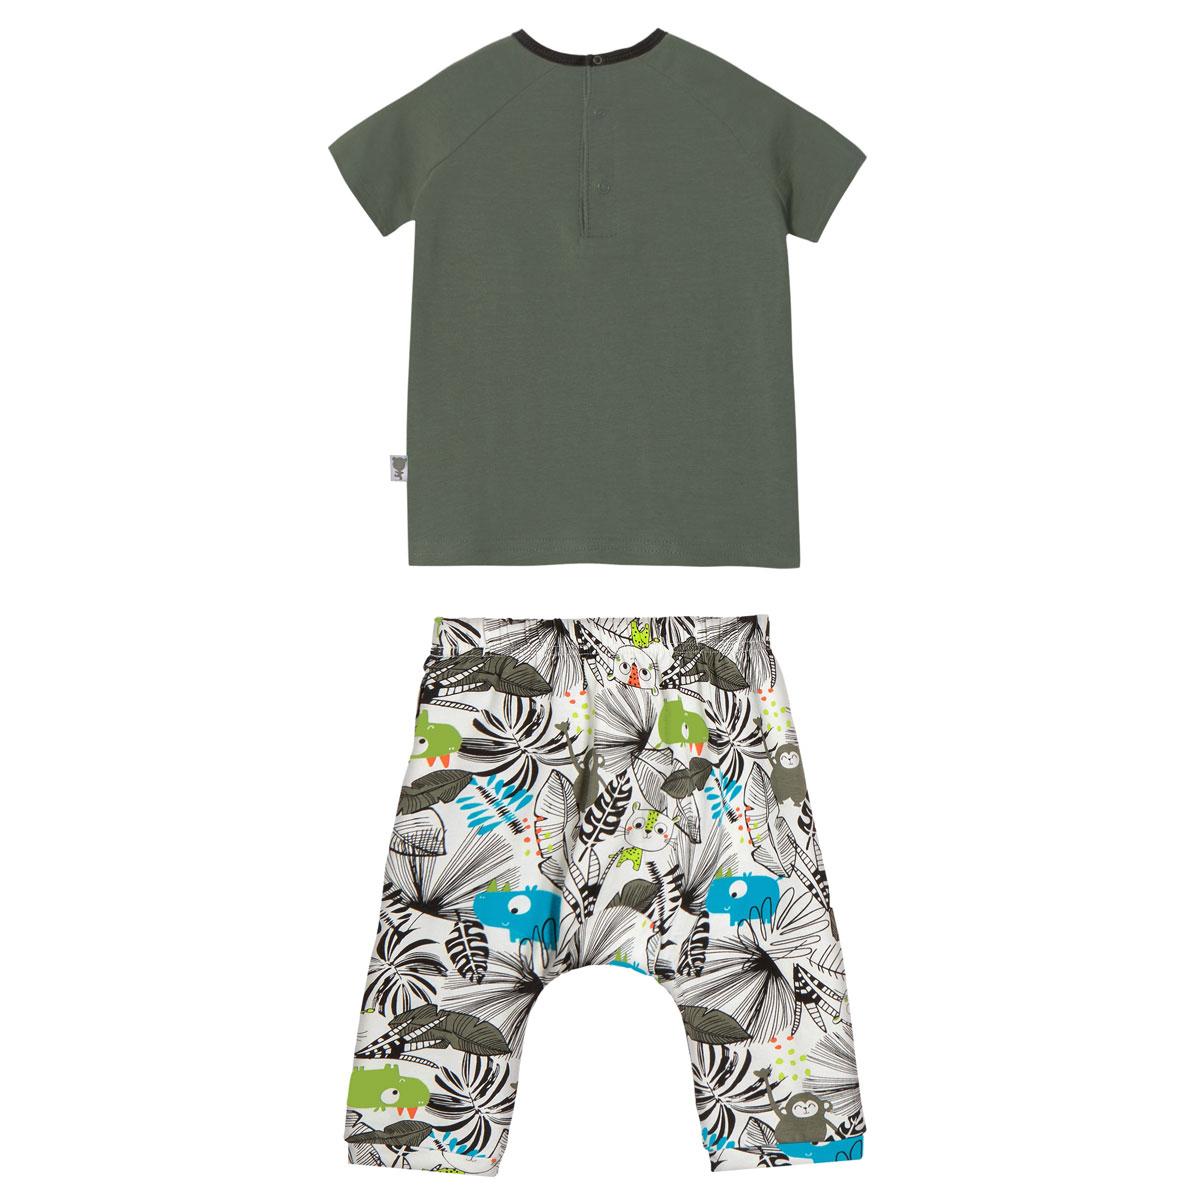 Ensemble bébé garçon t-shirt + sarouel Rafiki dos